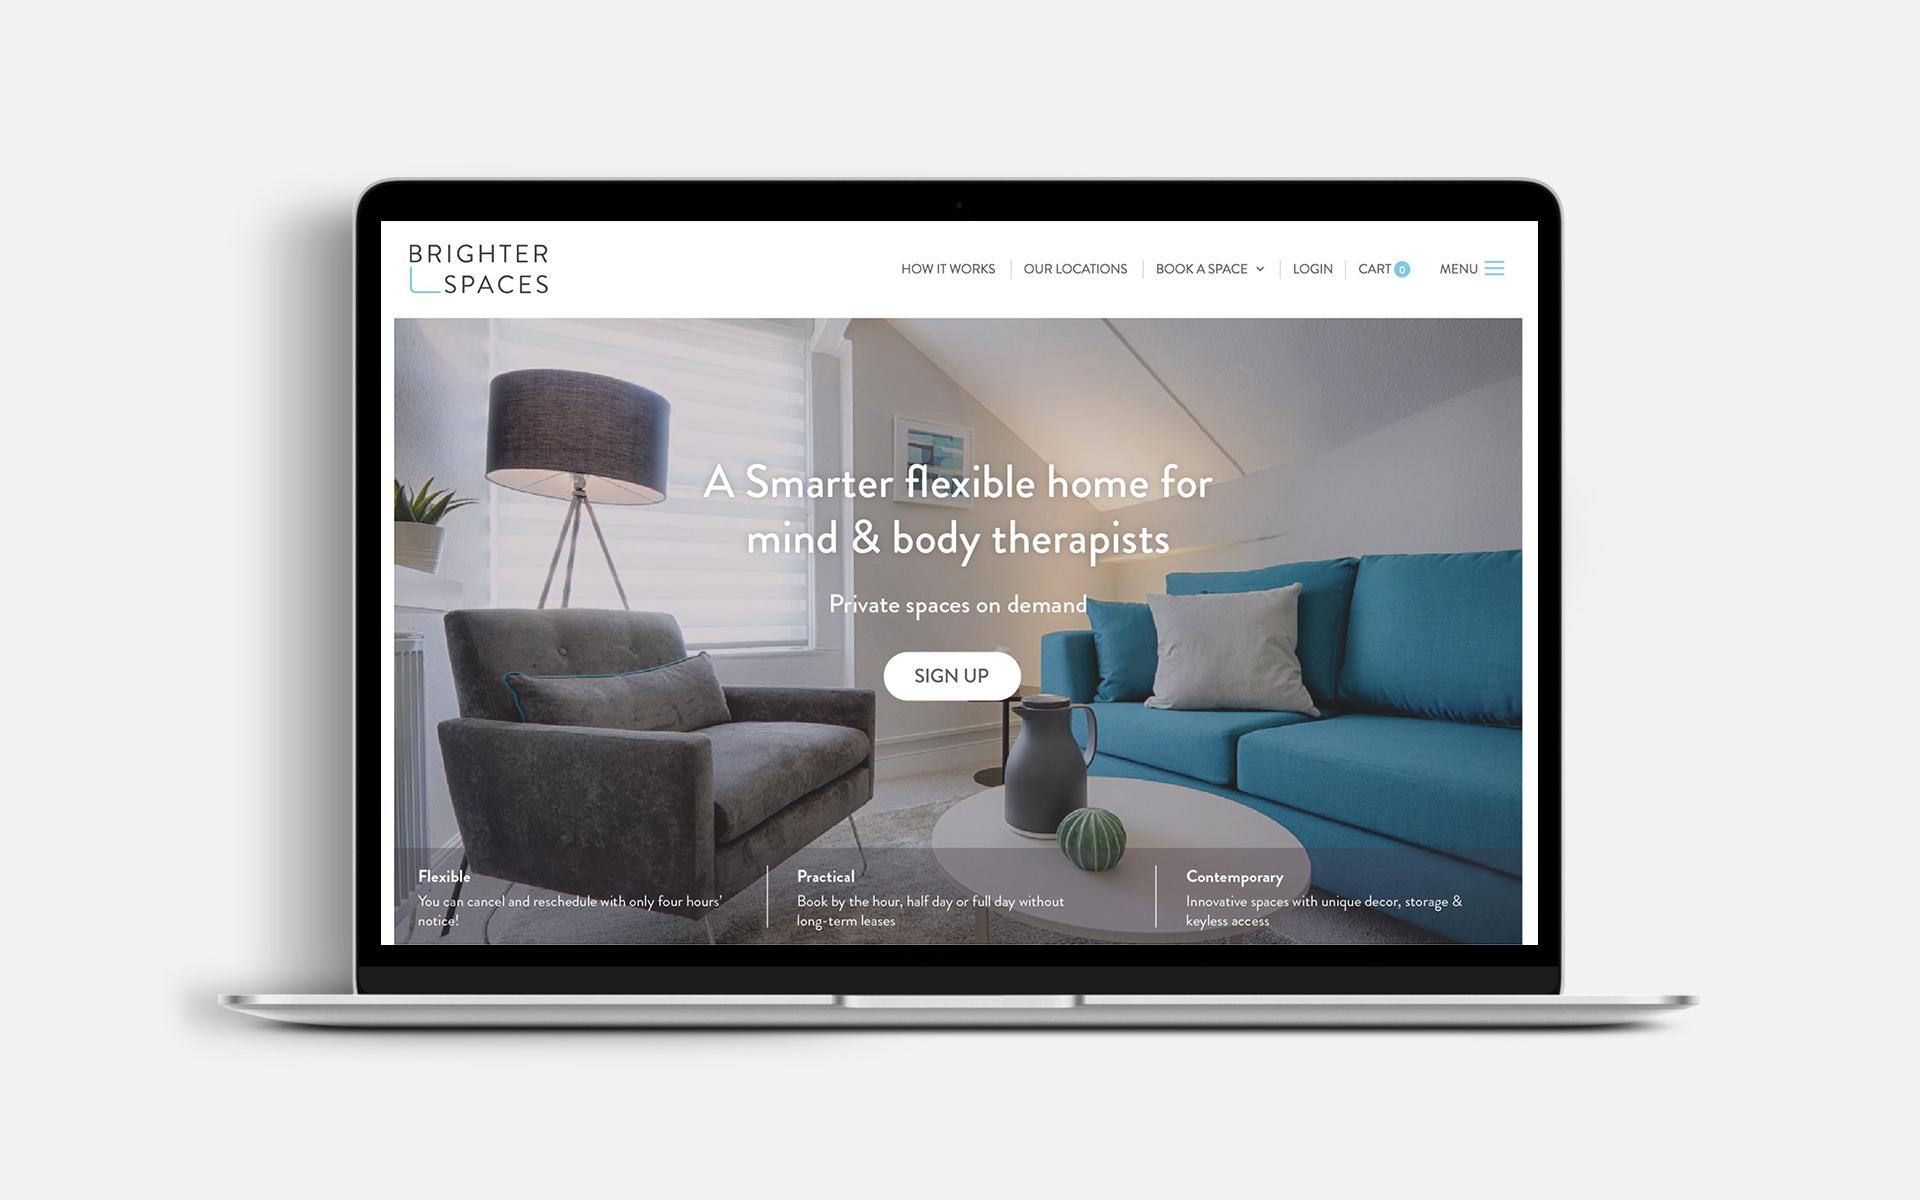 brighter-spaces-home-macbook